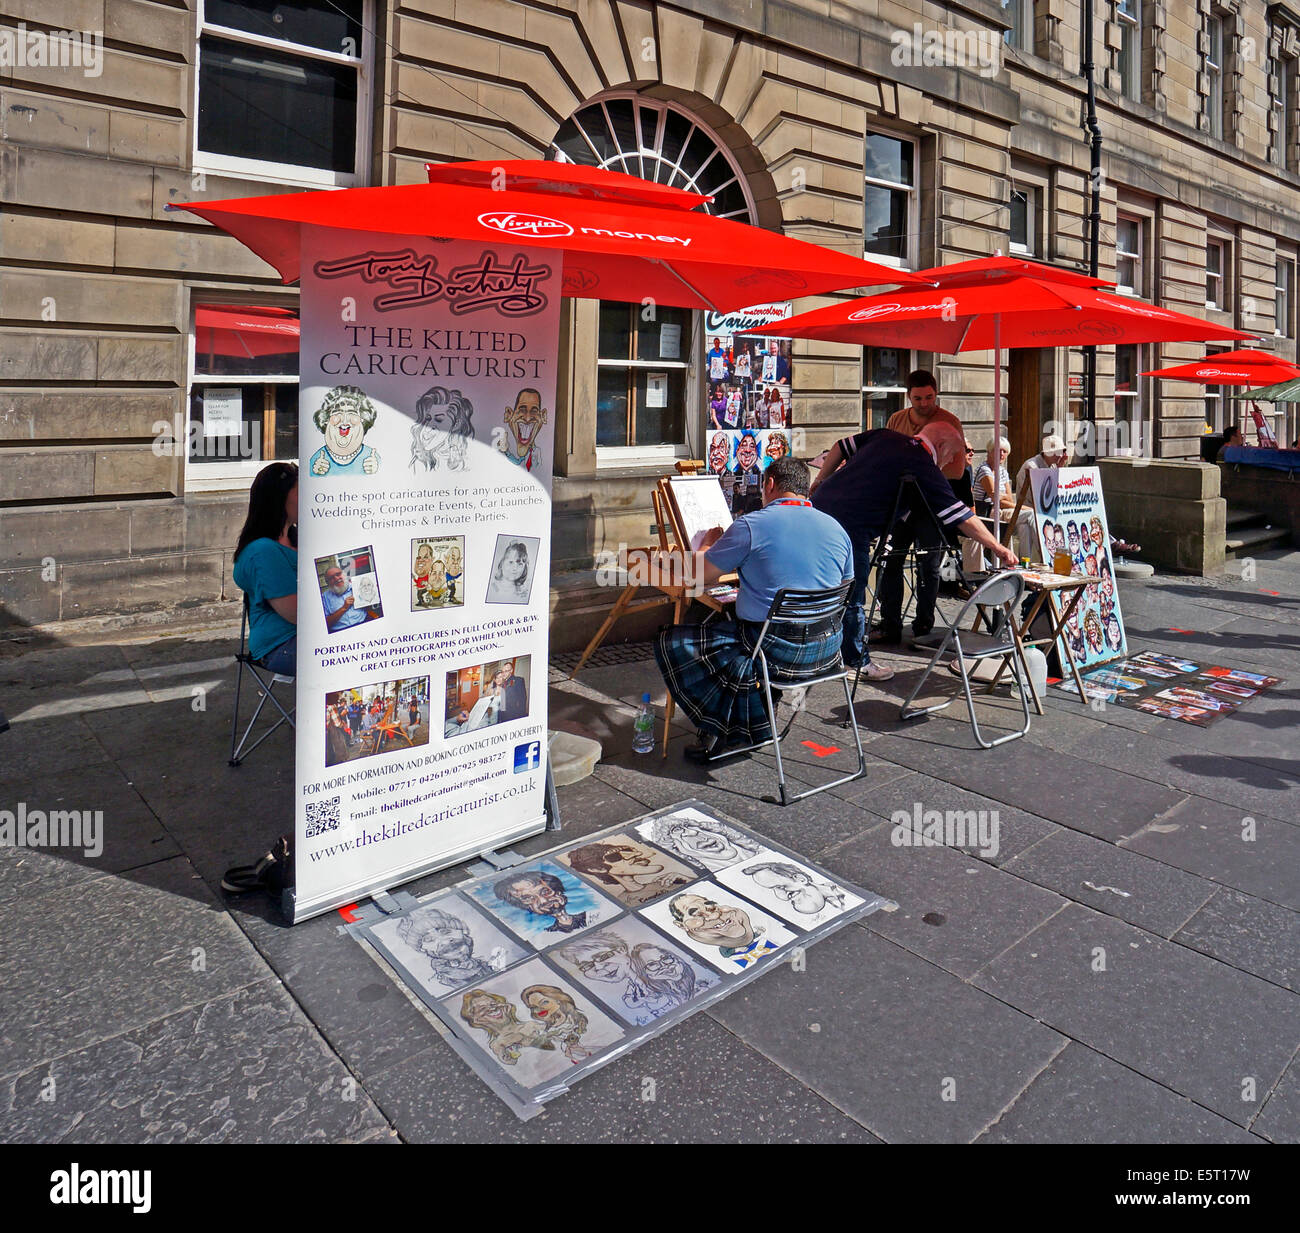 Edinburgh Fringe Festival 2014 caricature painters in High Street The Royal Mile Edinburgh Scotland - Stock Image